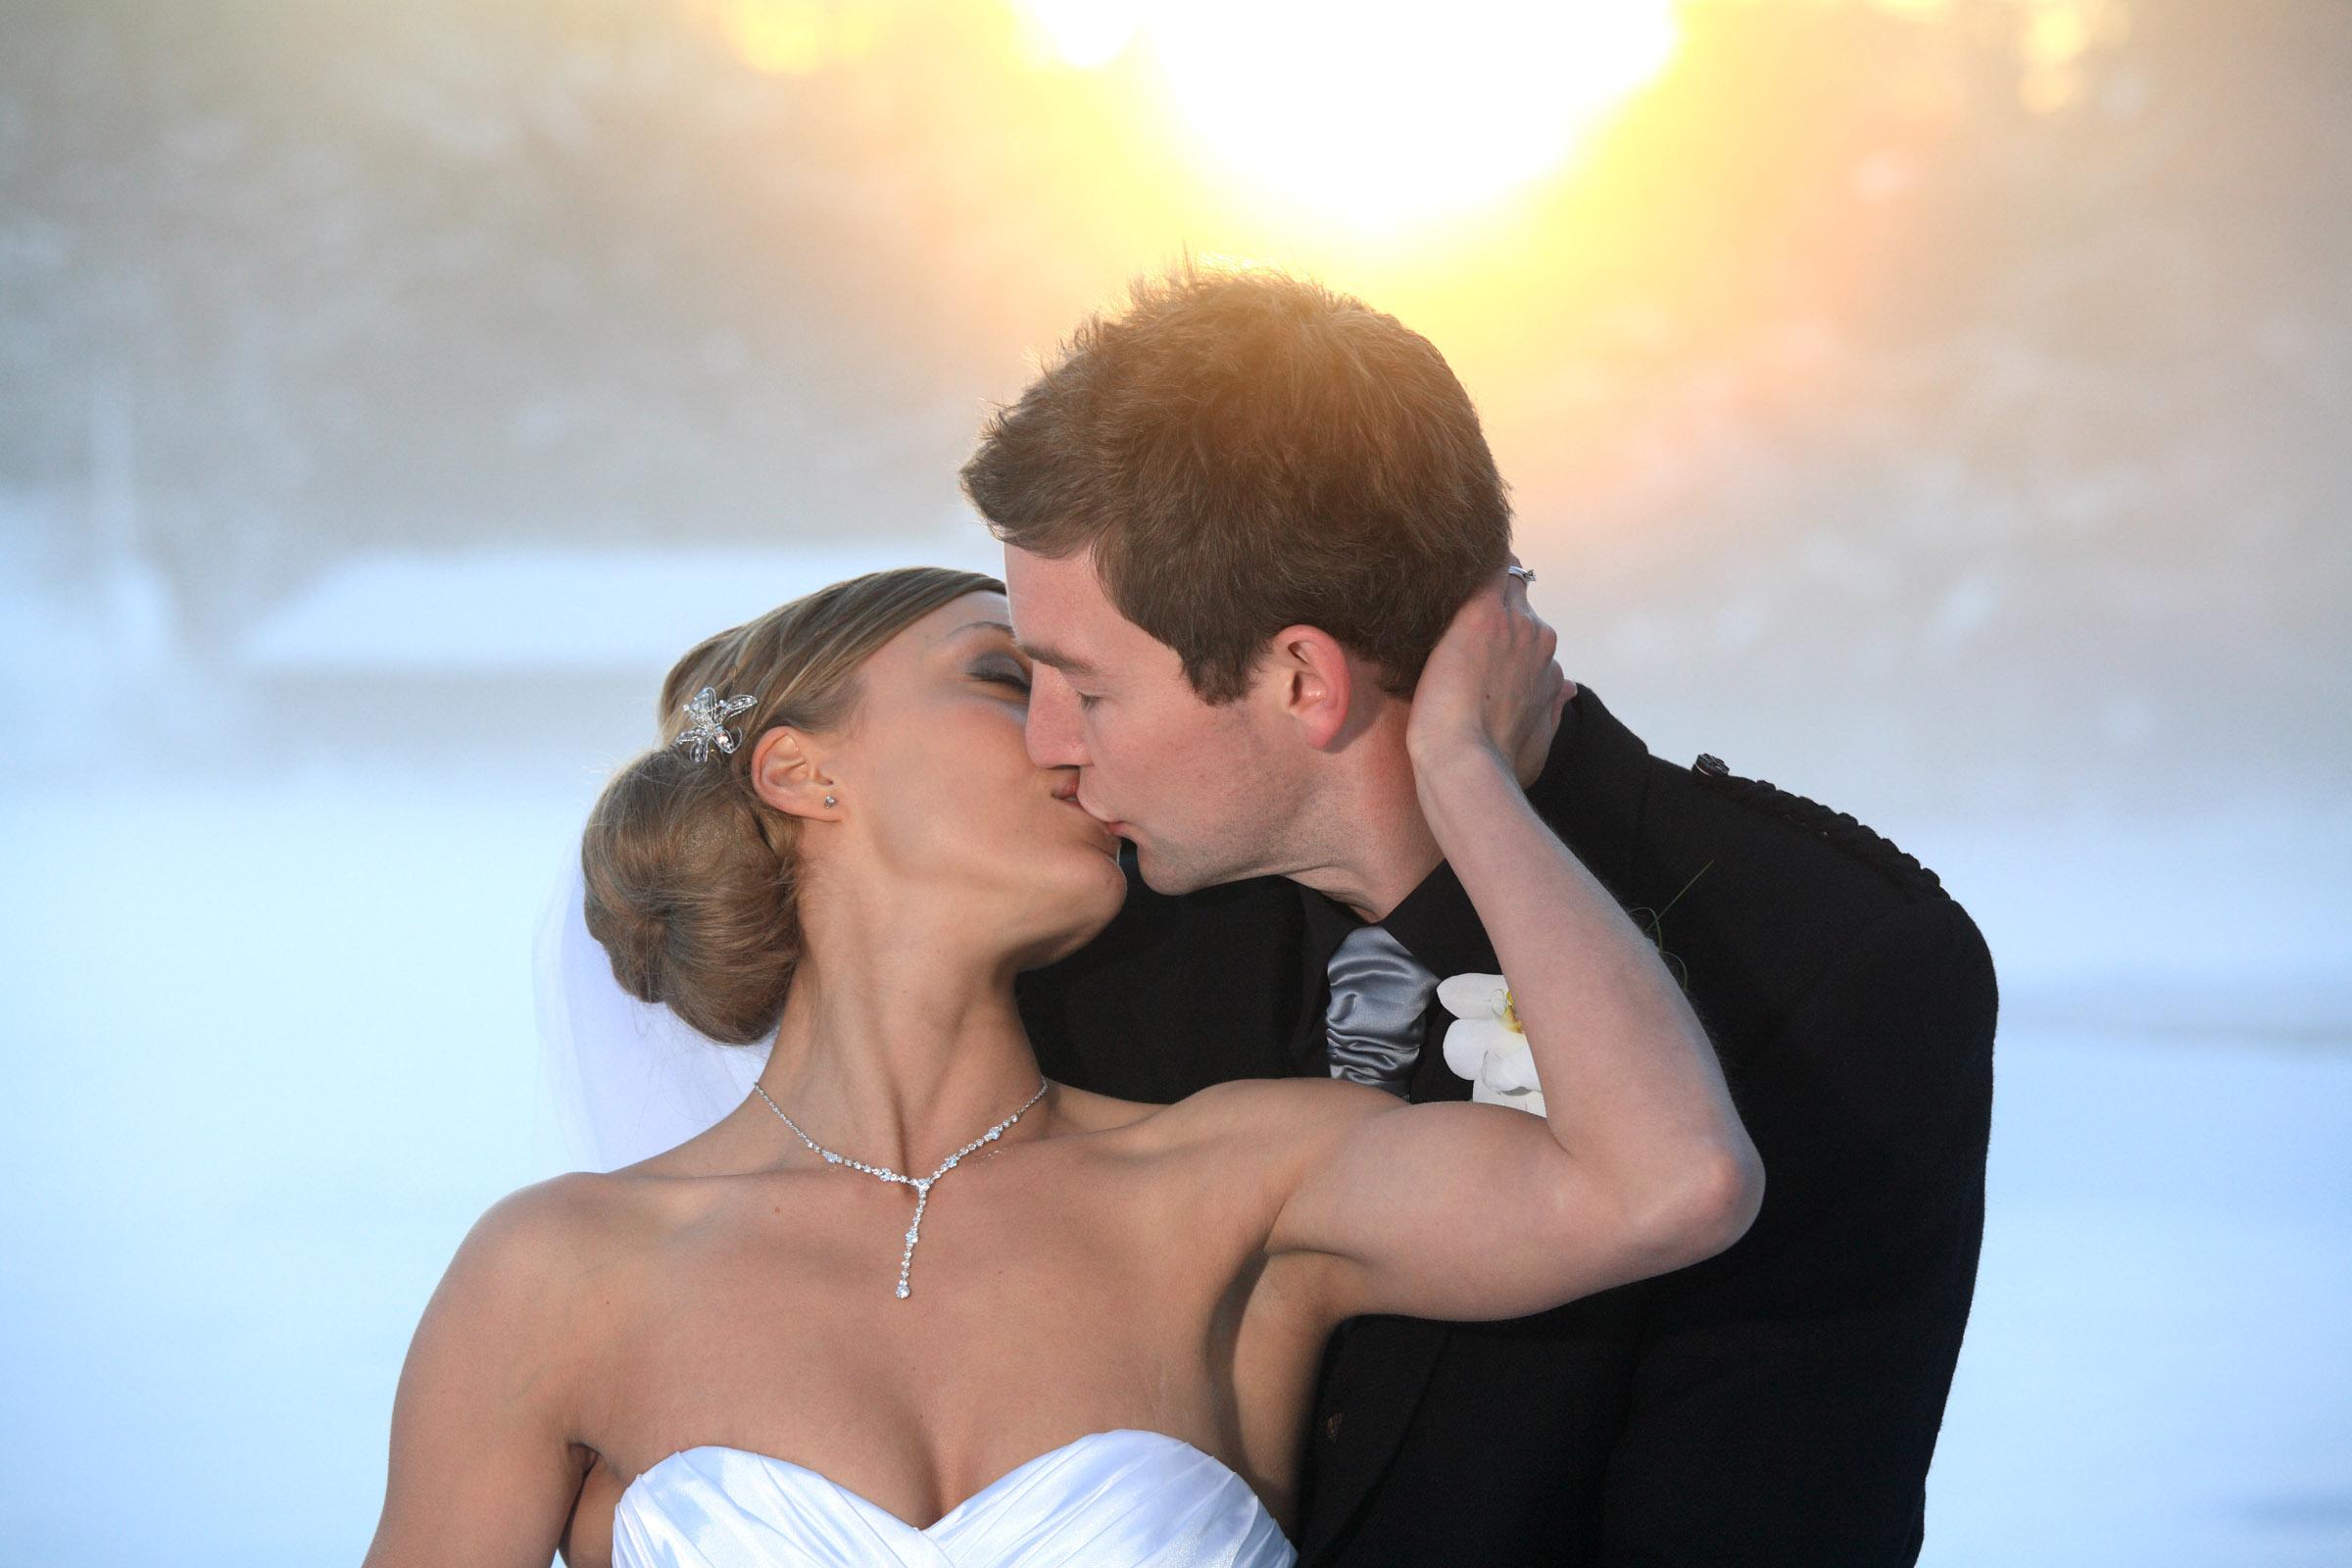 B&G sunset Wedding Photograph.jpg